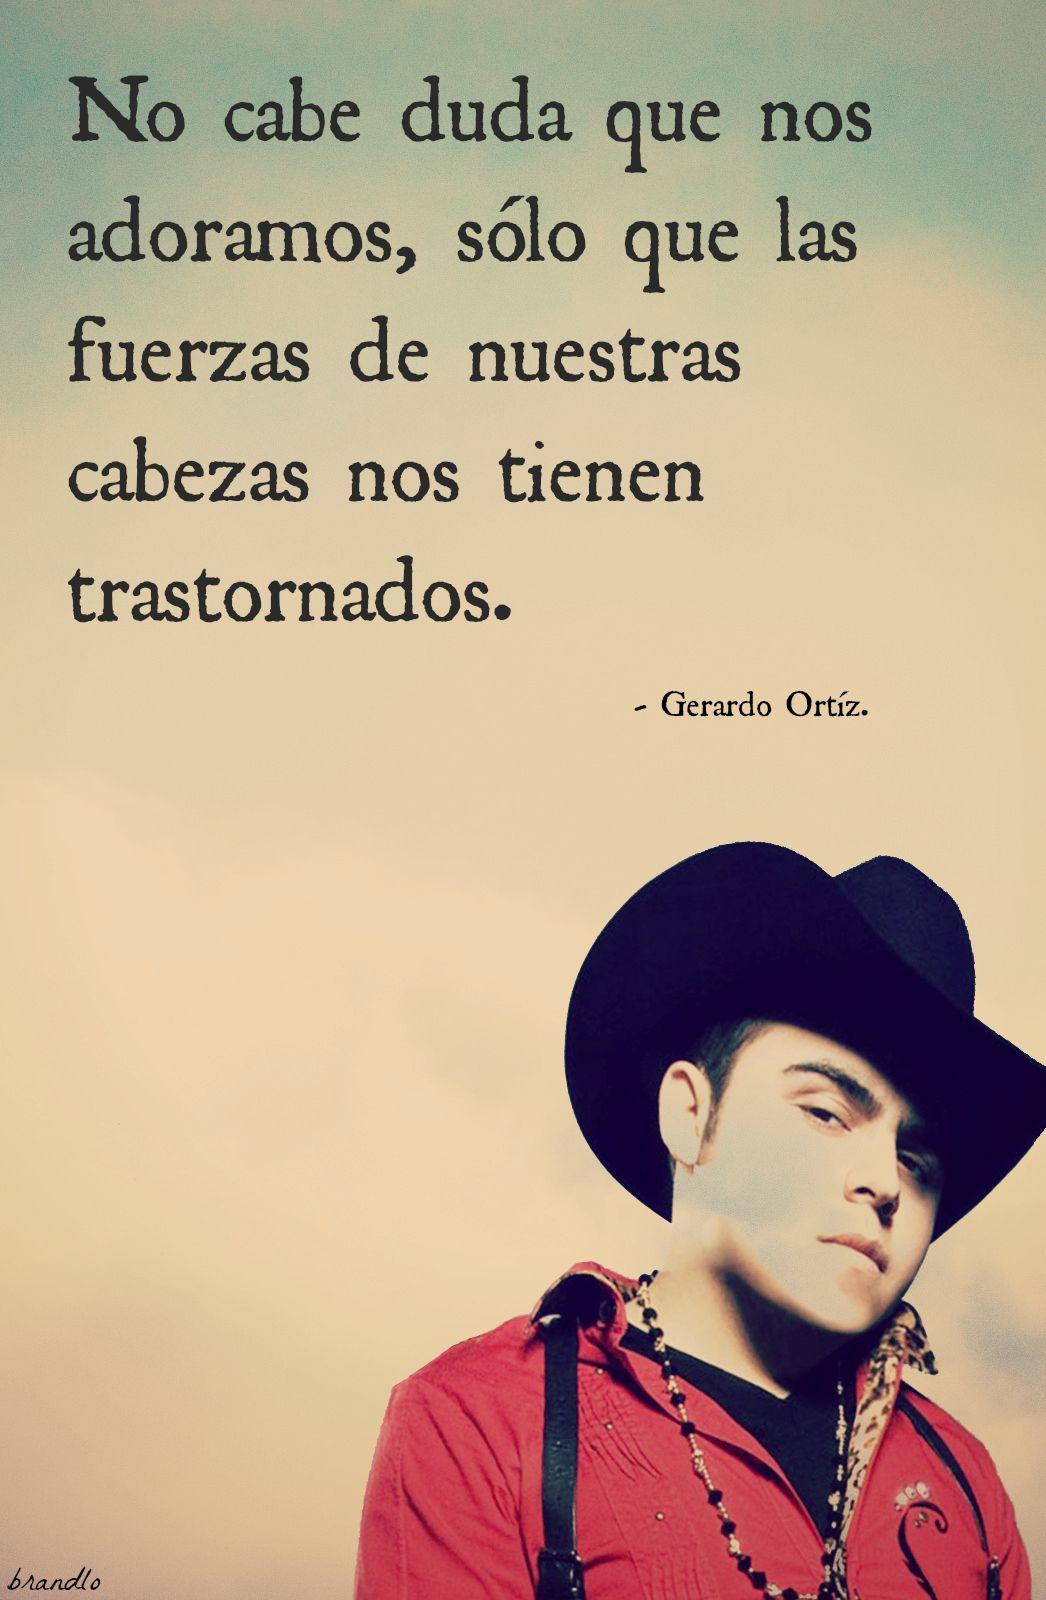 Gerardo Ortiz Quotes De Amor Quotesgram Frases De Musica